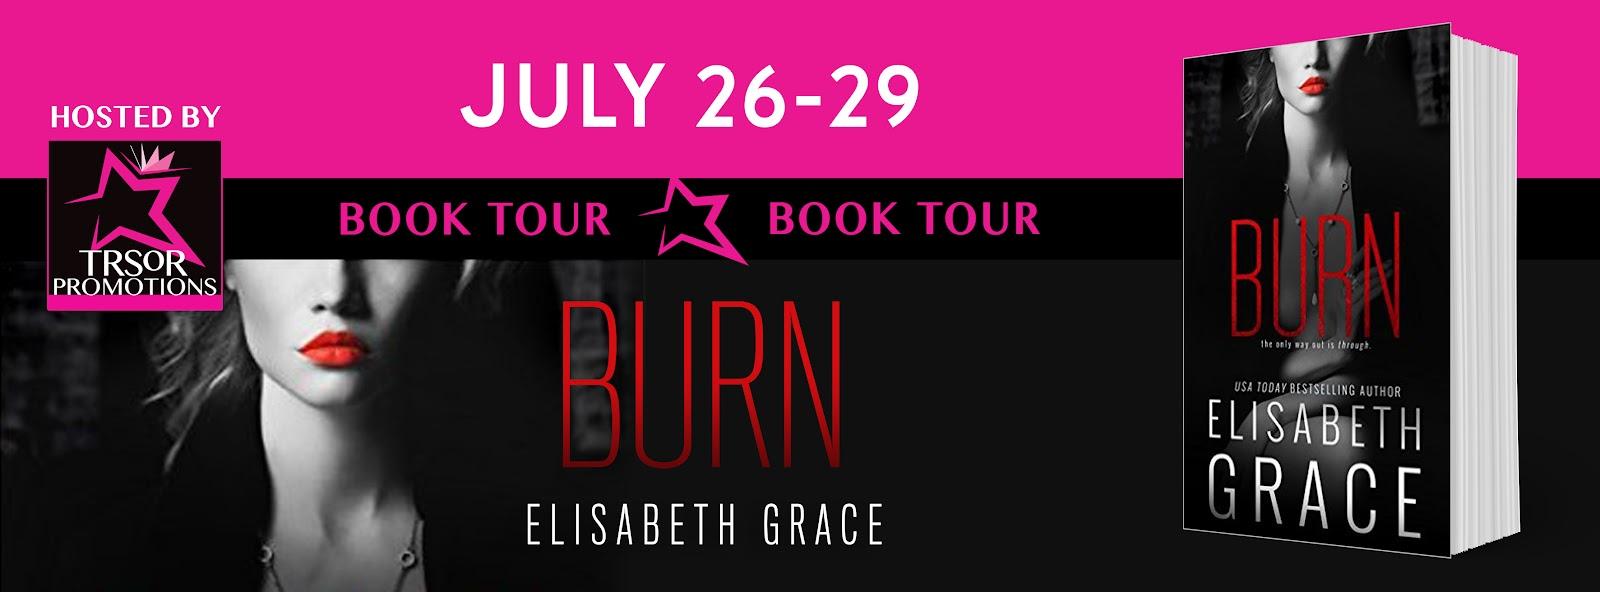 BURN_BOOK_TOUR.jpg